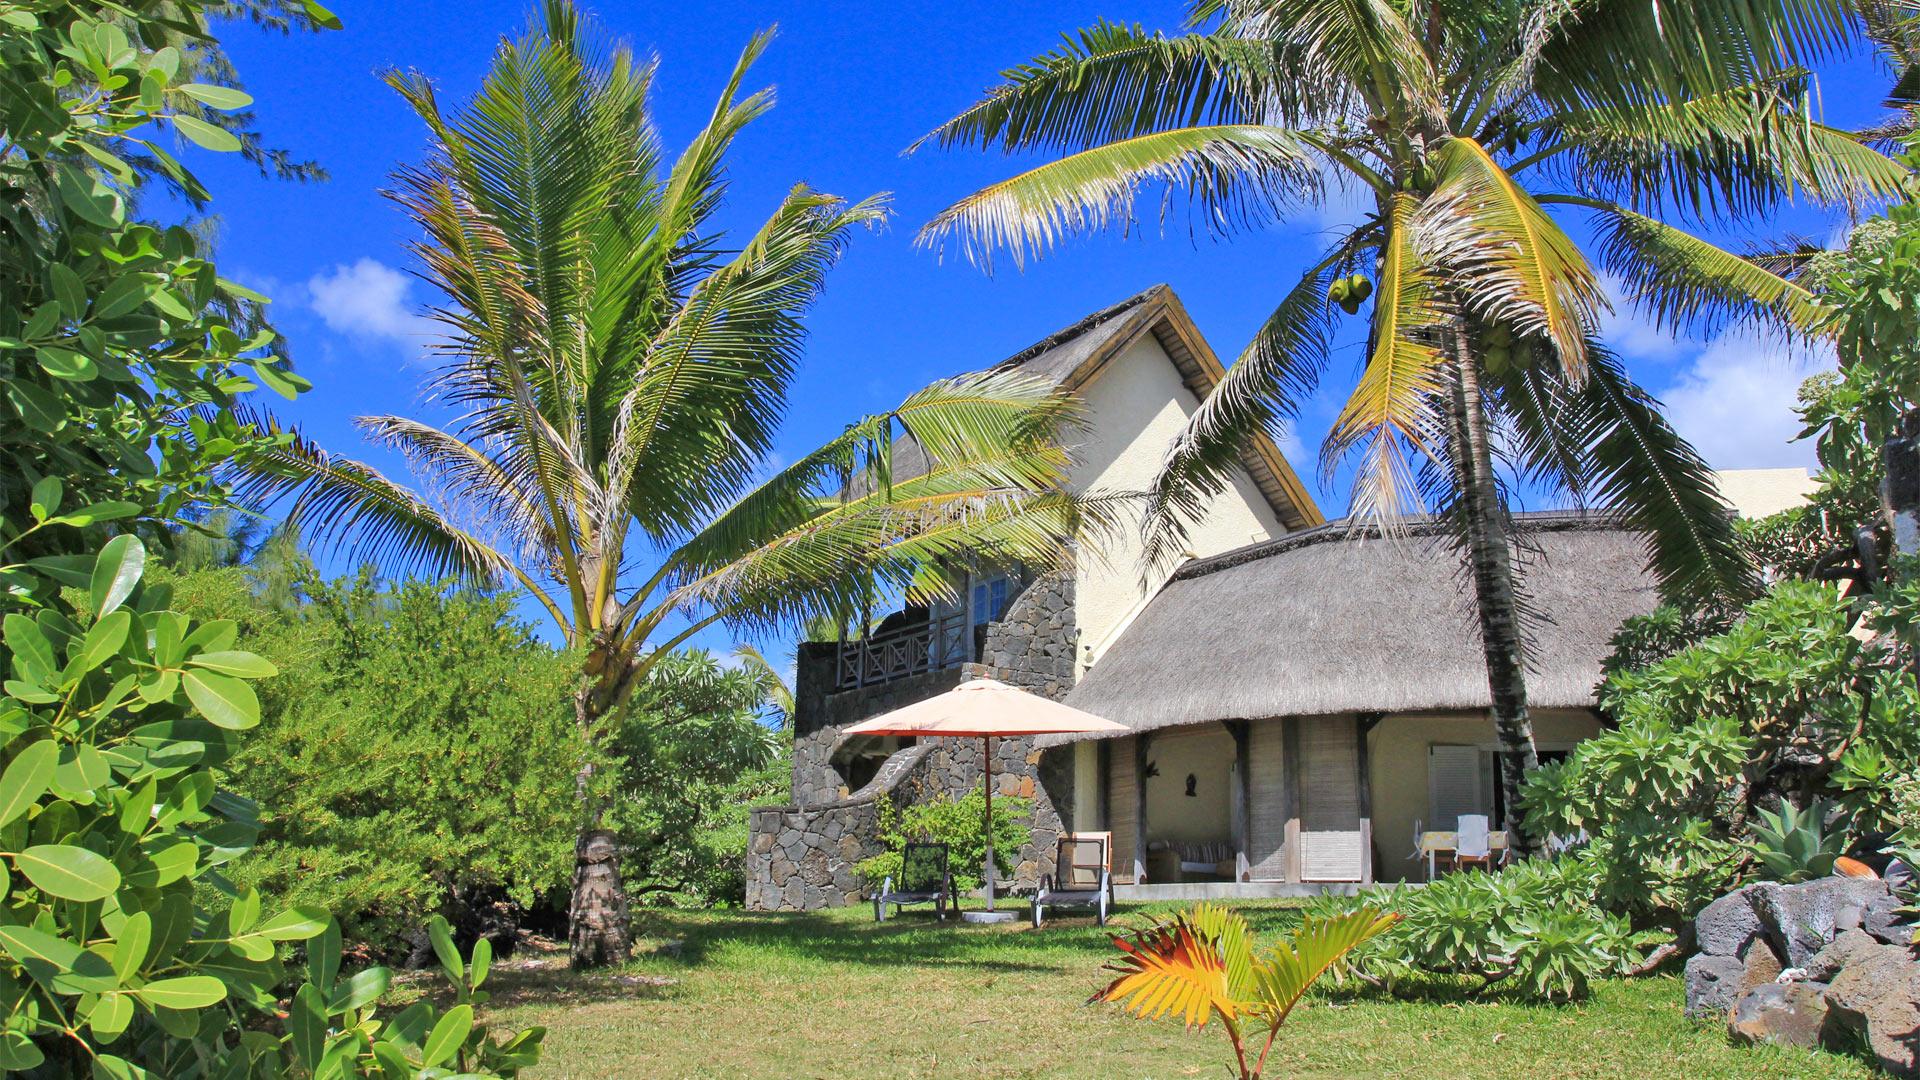 Villa Villa Vetyver, Rental in Mauritius East